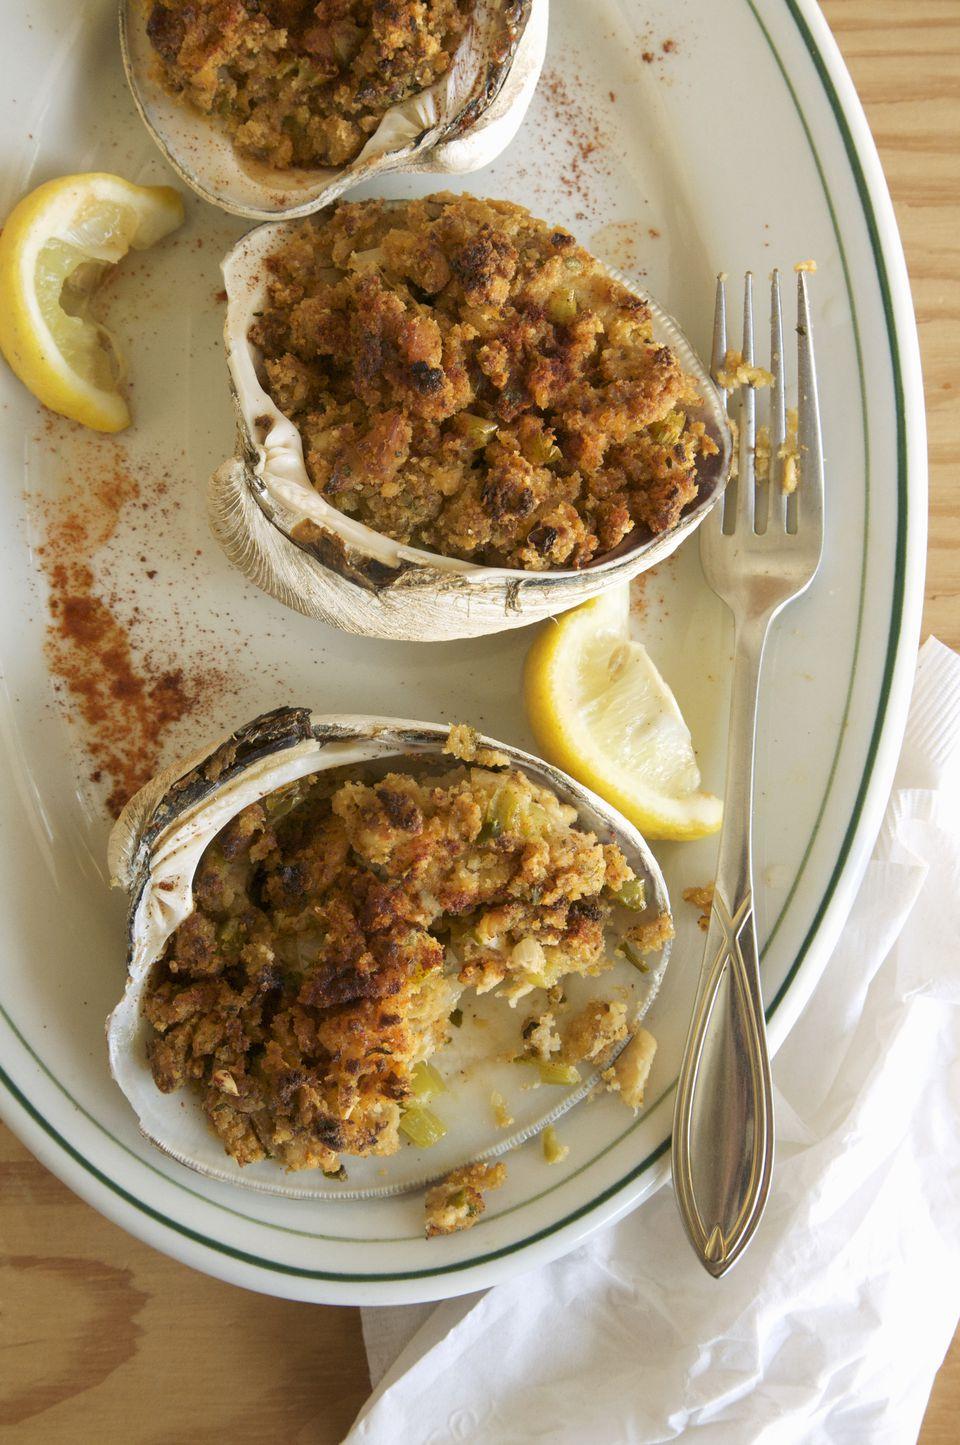 Stuffed clams with lemon garnish on plate, close up